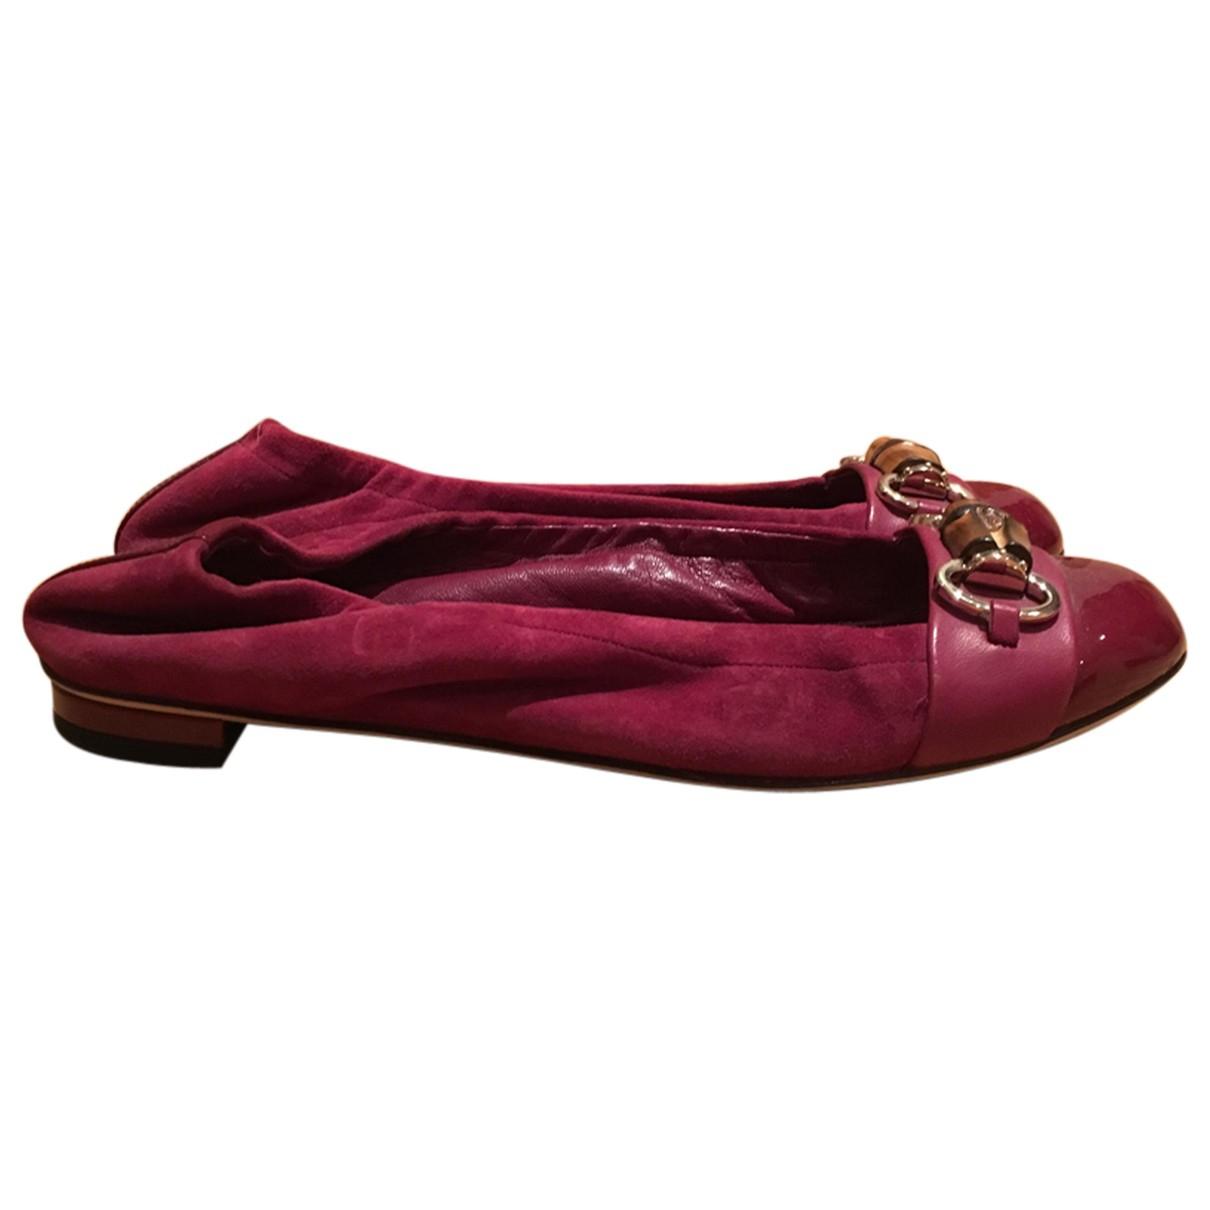 Gucci \N Suede Ballet flats for Women 38 EU